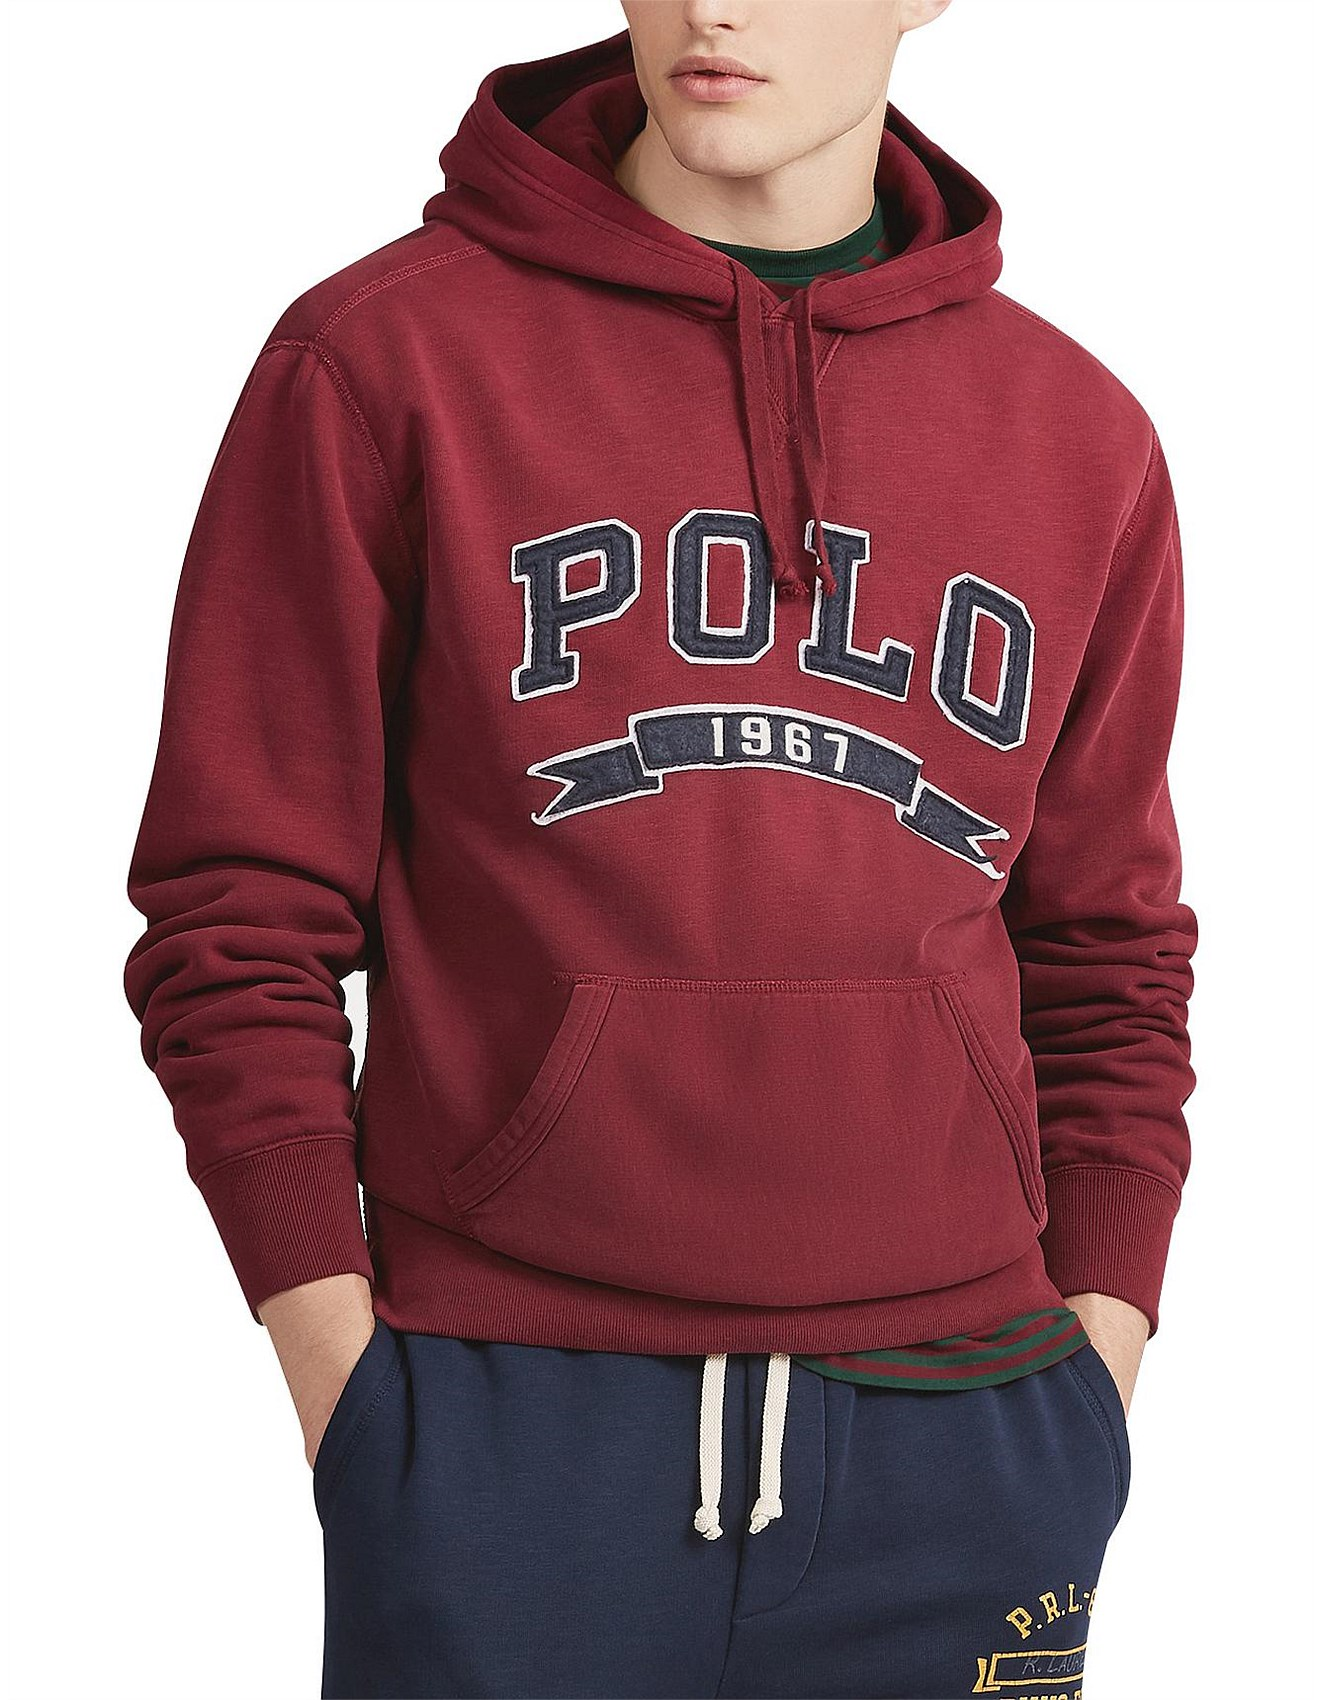 aeedbec38 Polo Ralph Lauren